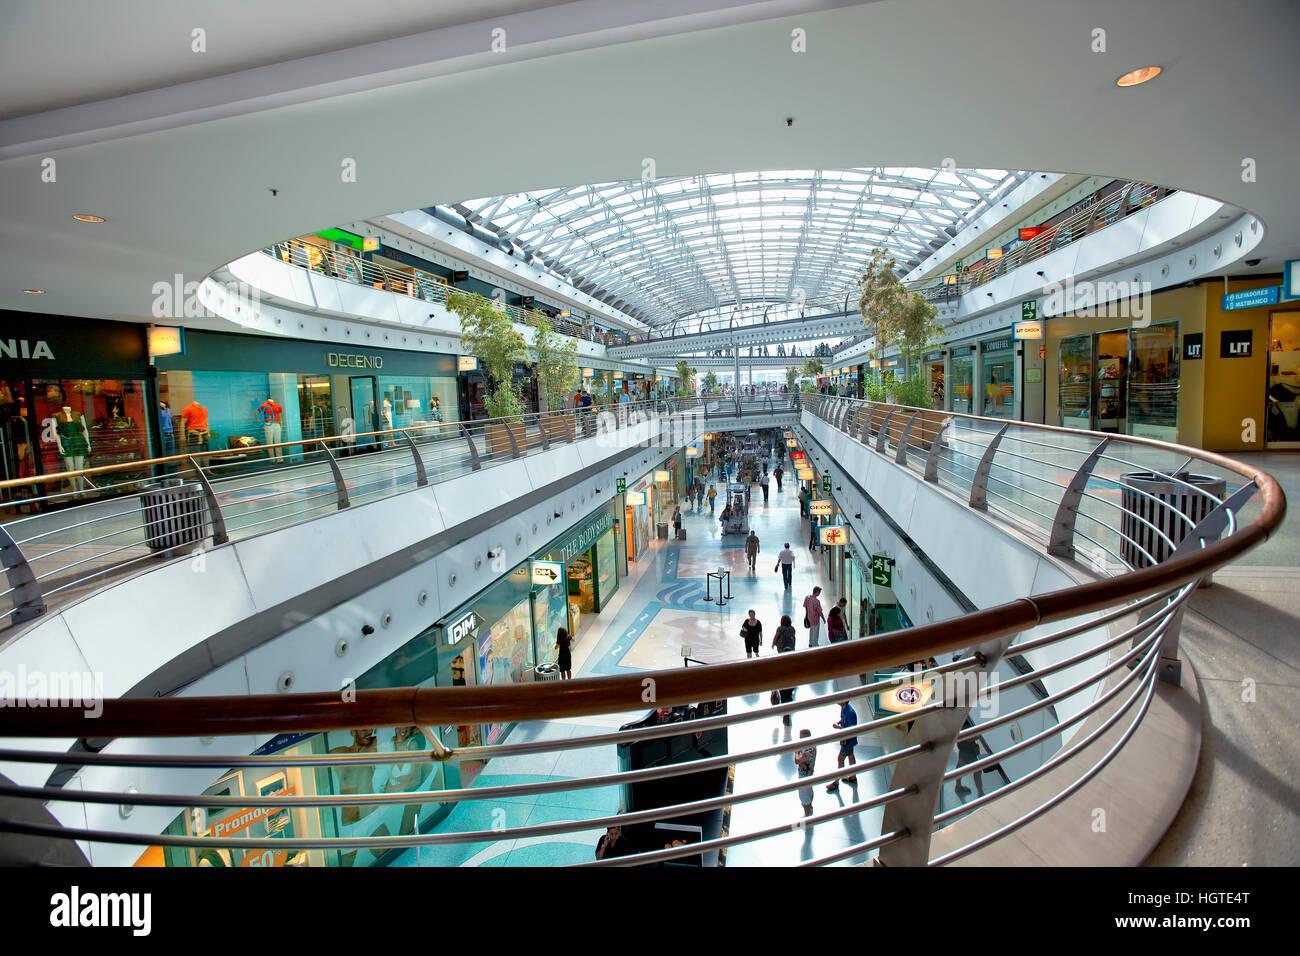 Vasco de Gama shopping center in the Oriente district in Lisbon - Stock Image